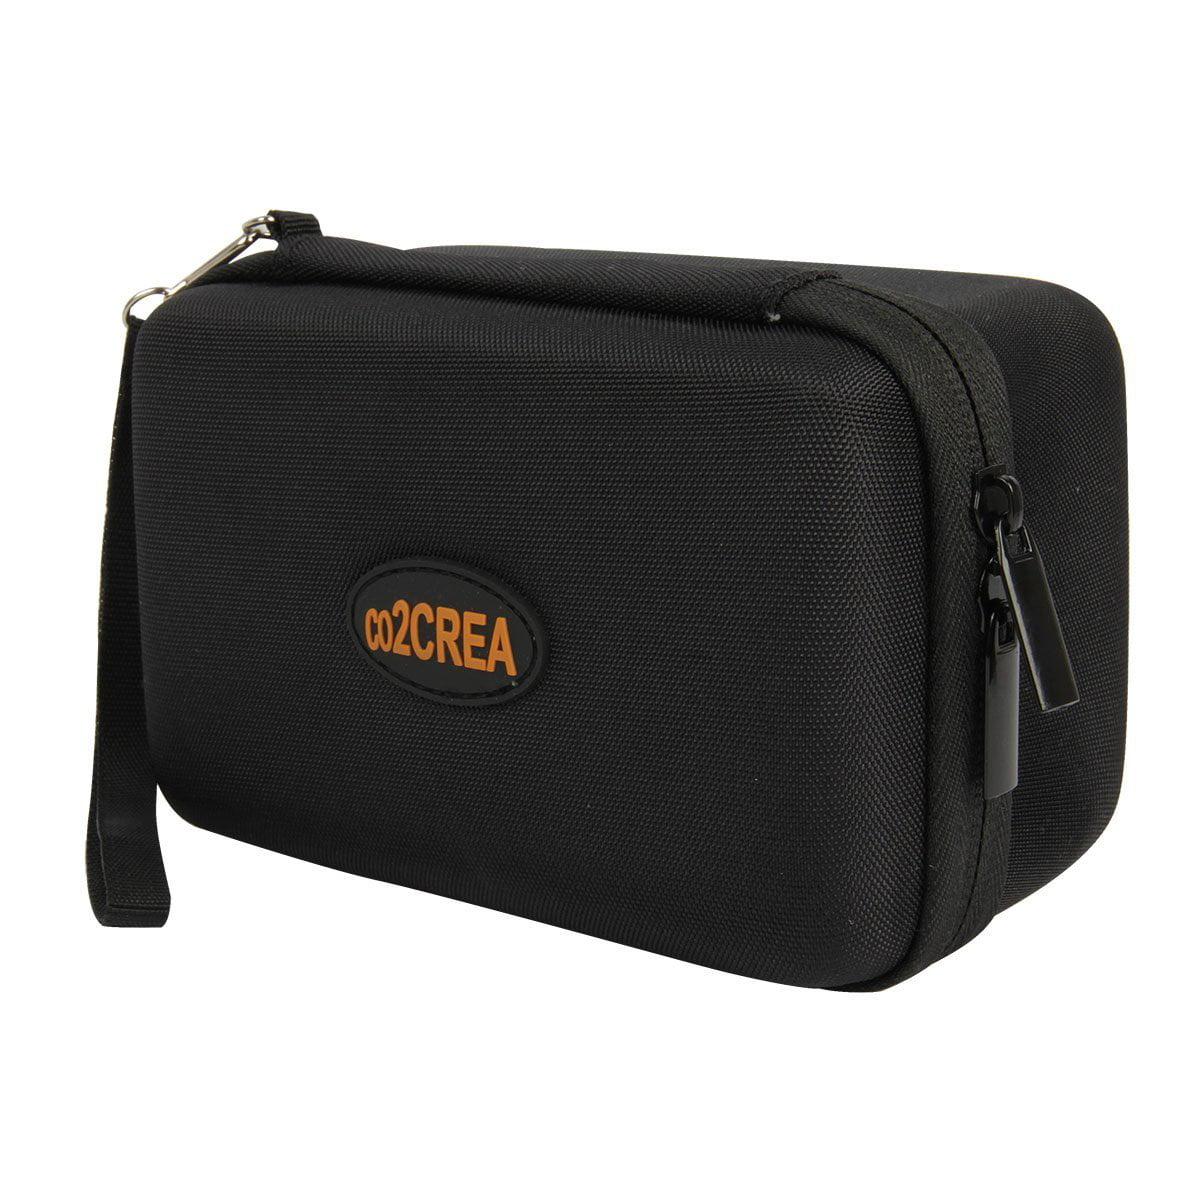 co2CREA Hard Shell EVA Carrying Storage Travel Case Bag f...